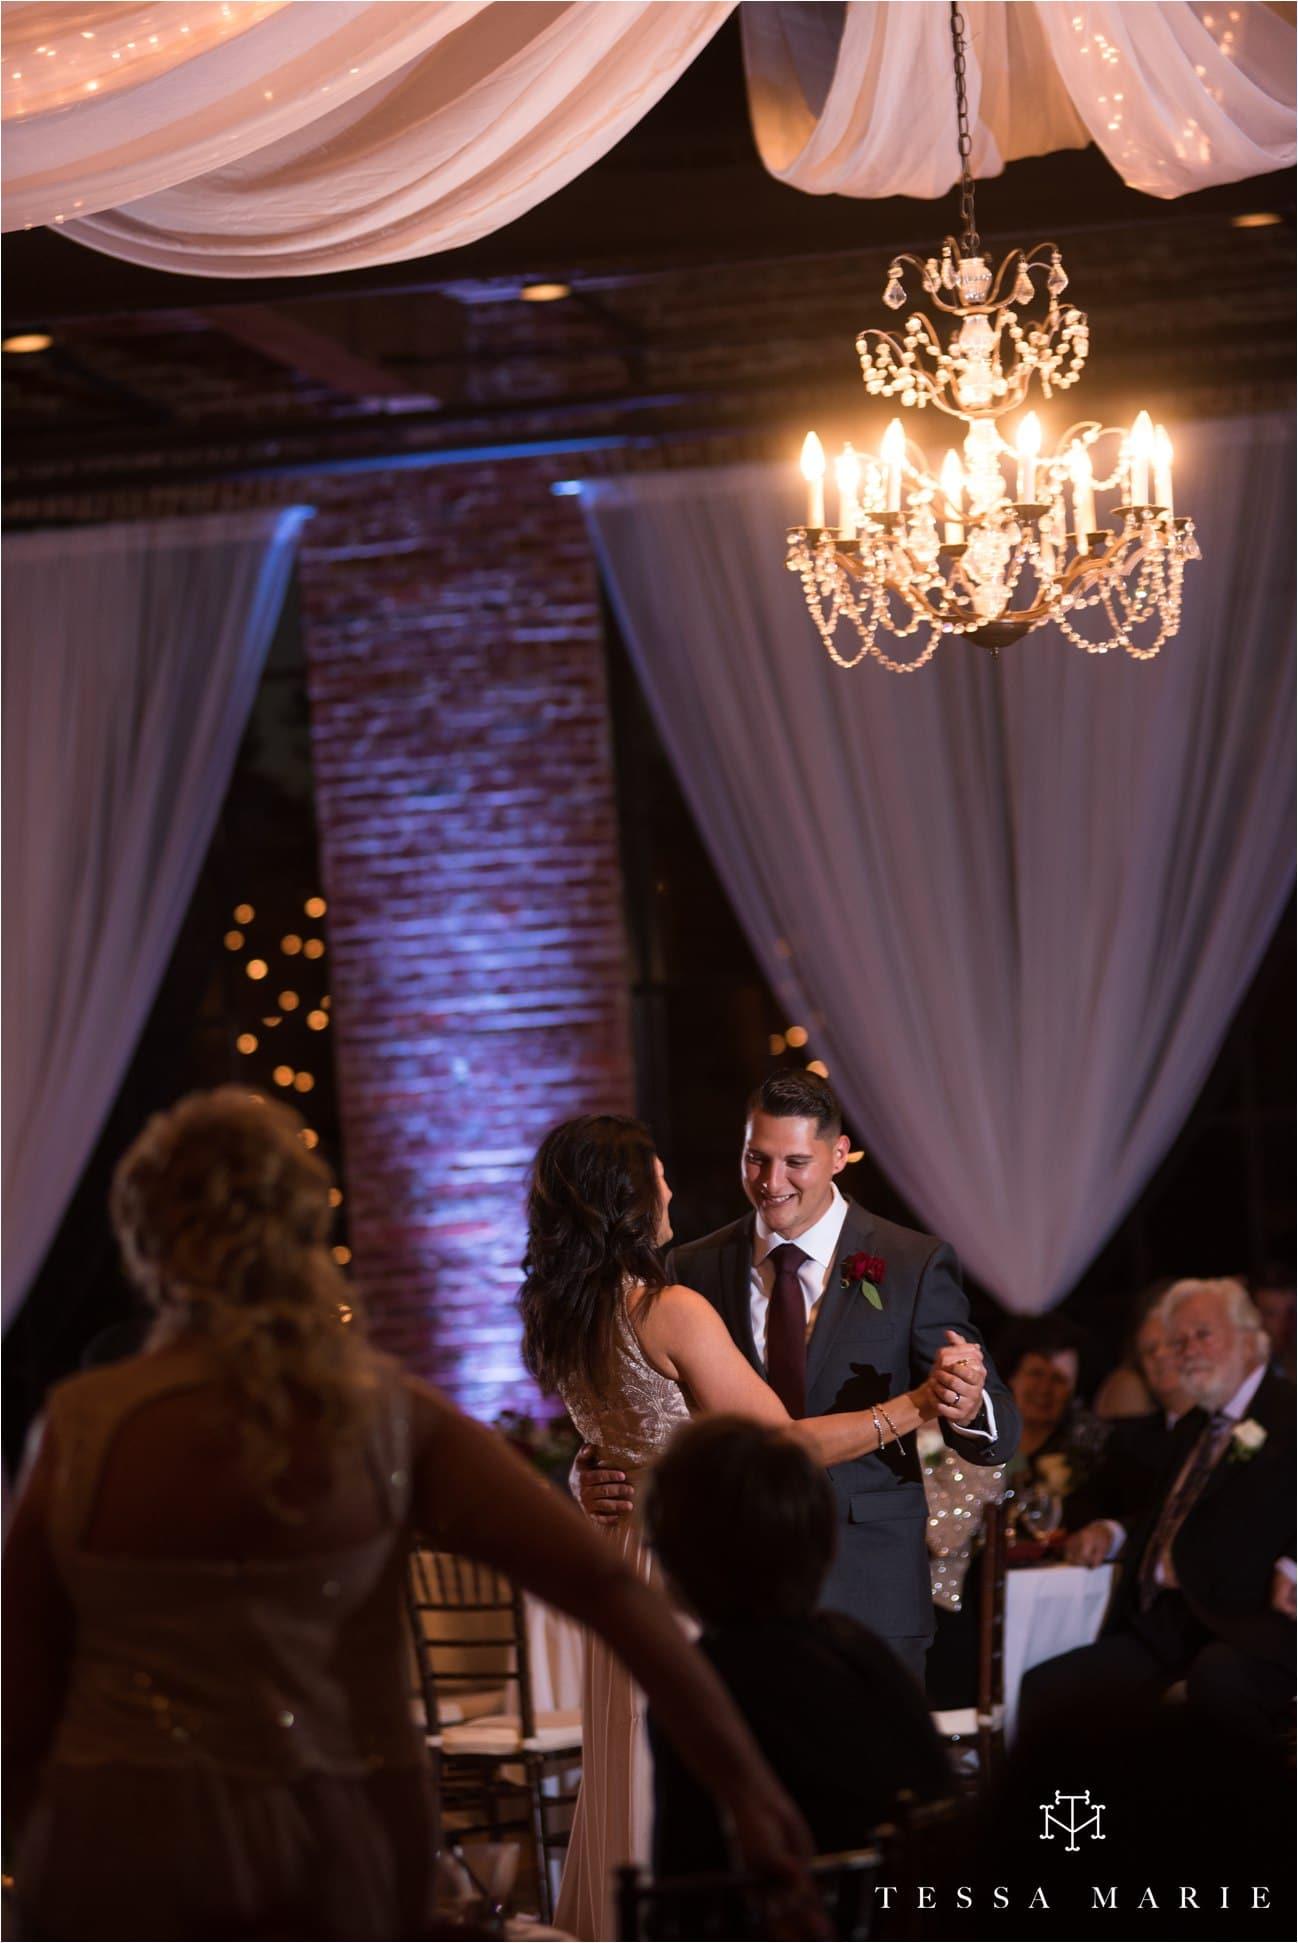 tessa_marie_weddings_rivermill_event_centere_candid_outdoor_wedding_photos_0342